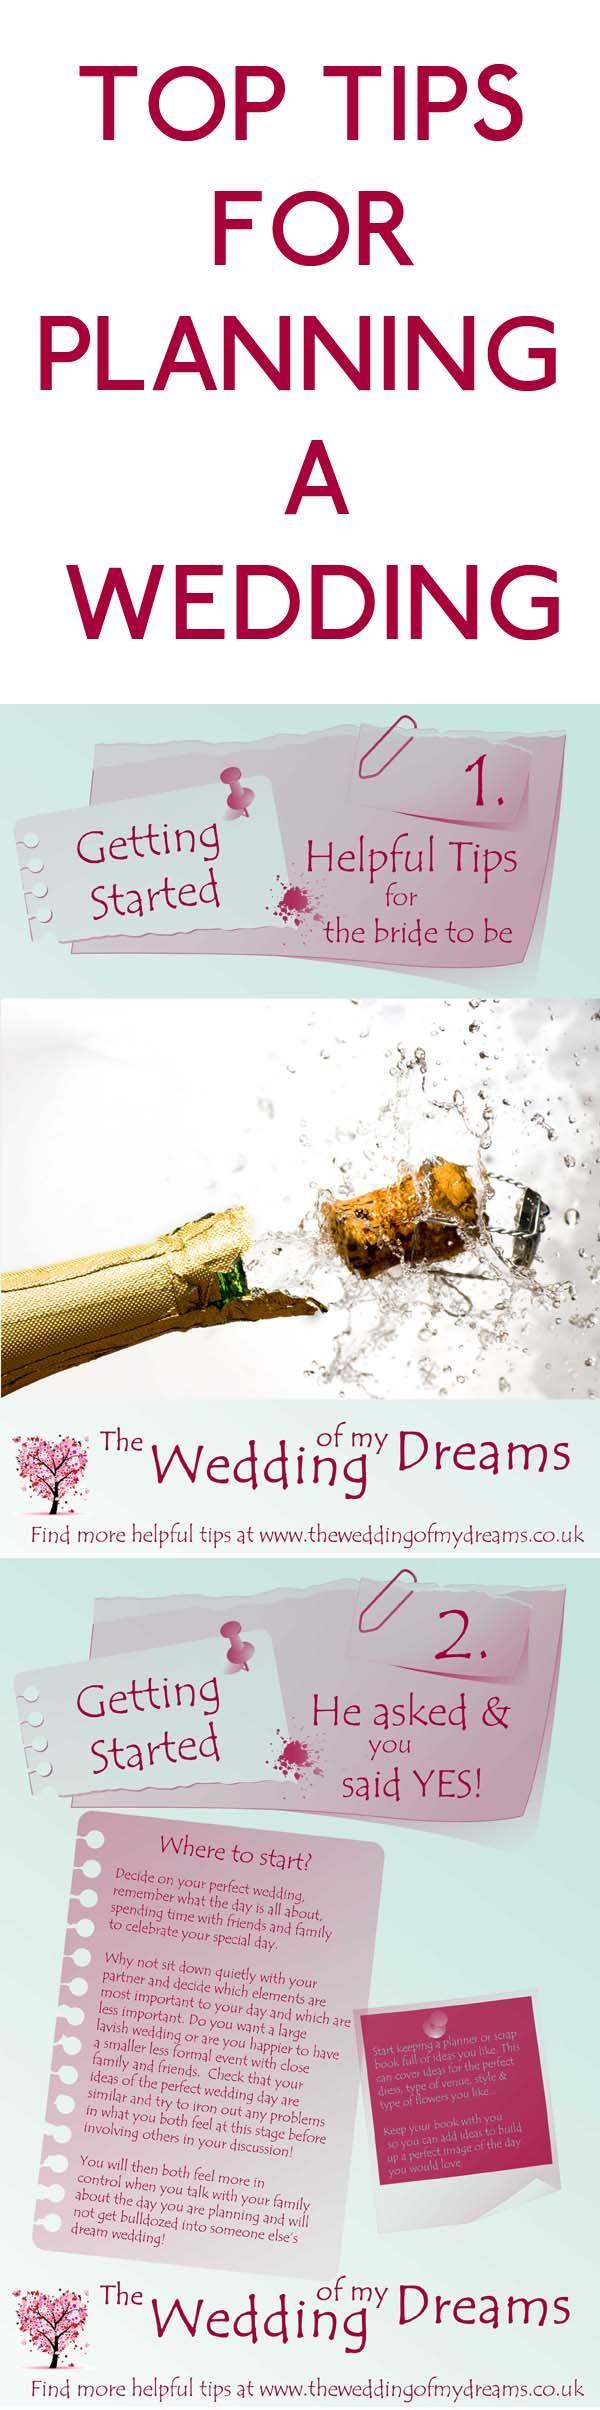 17 Best ideas about Plan My Wedding on Pinterest